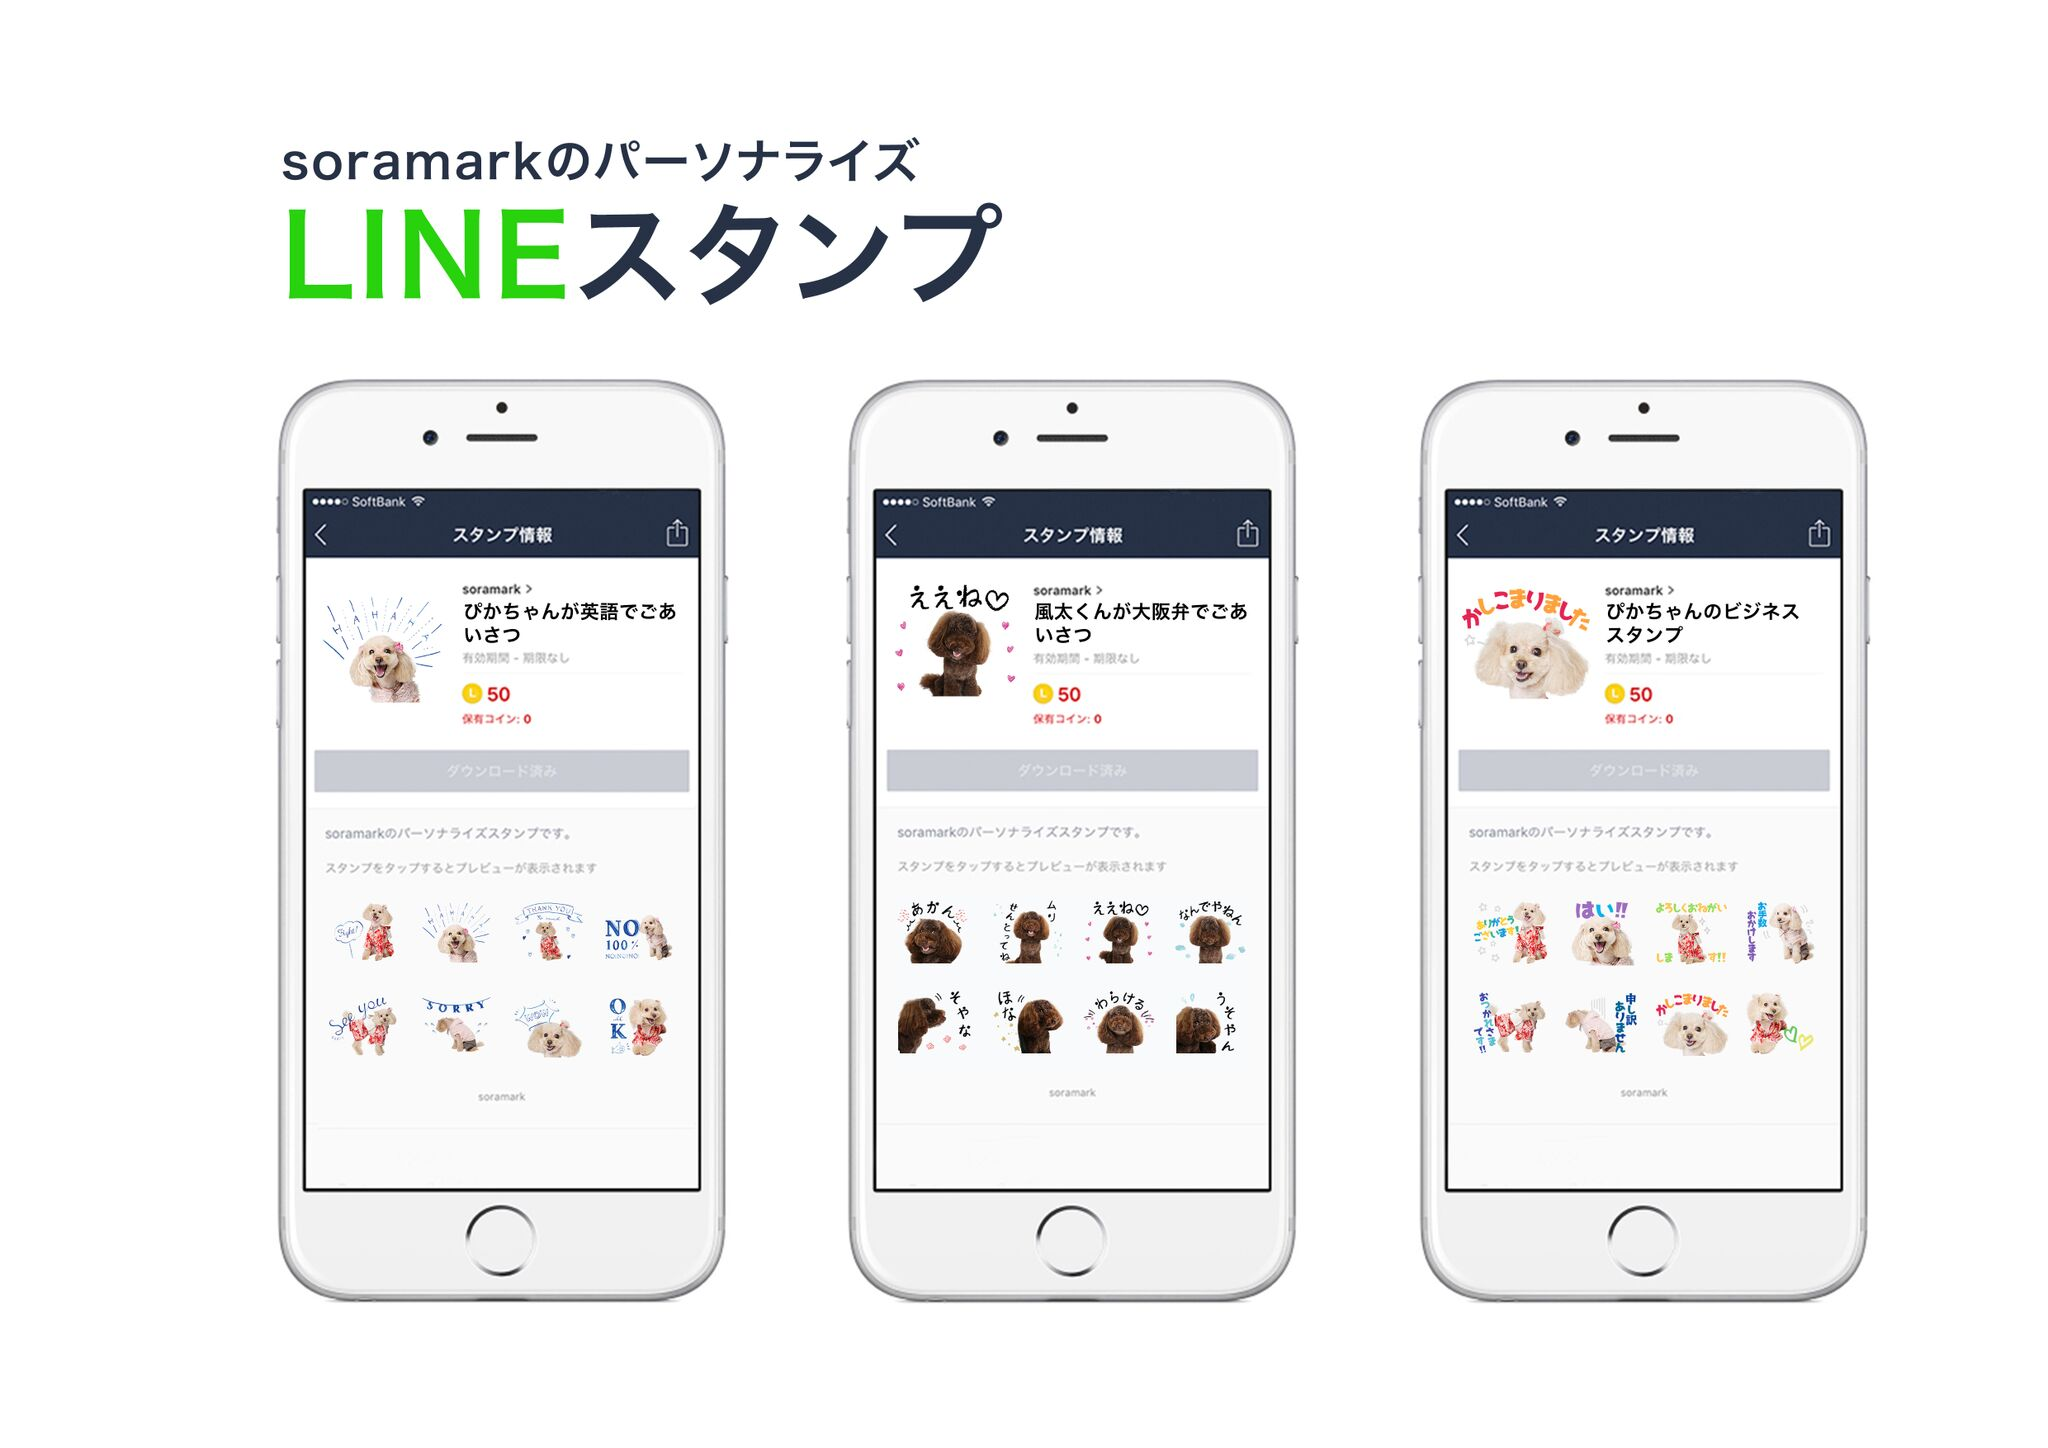 2018/02/03~02/04 Soramark LINEスタンプオーダー会